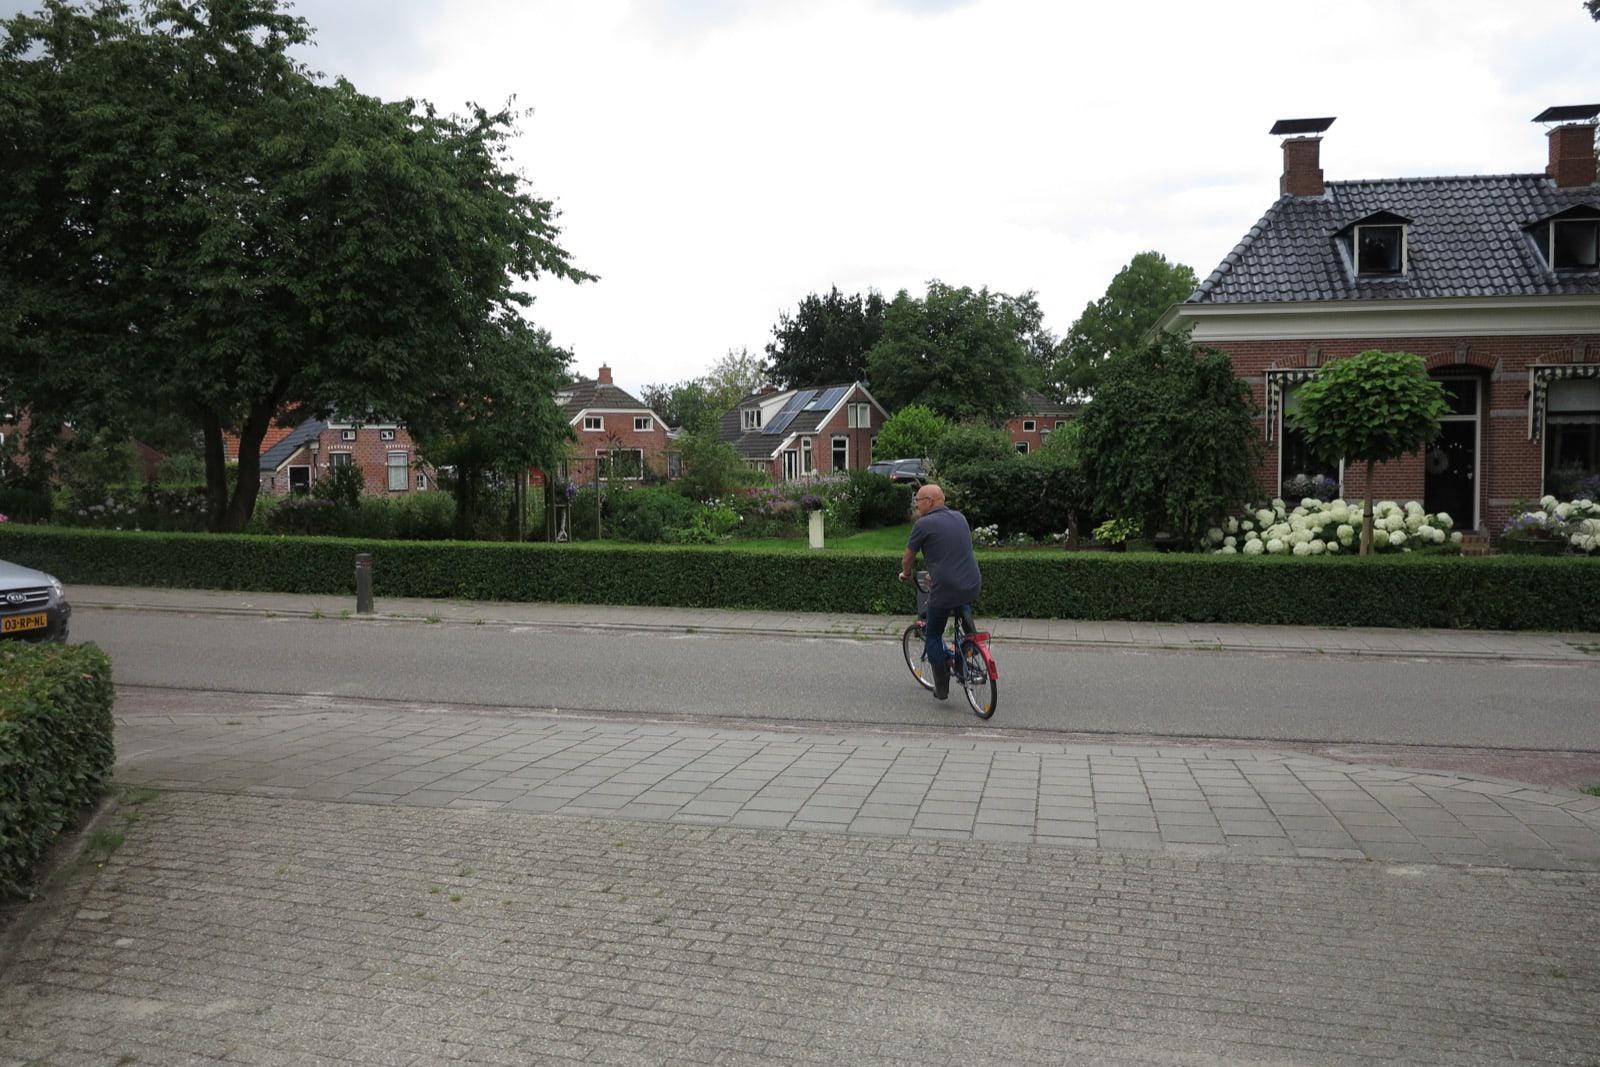 et-fiets-en-fietser-58-kees-van-zanten-op-vouwfietsje-oi.jpg